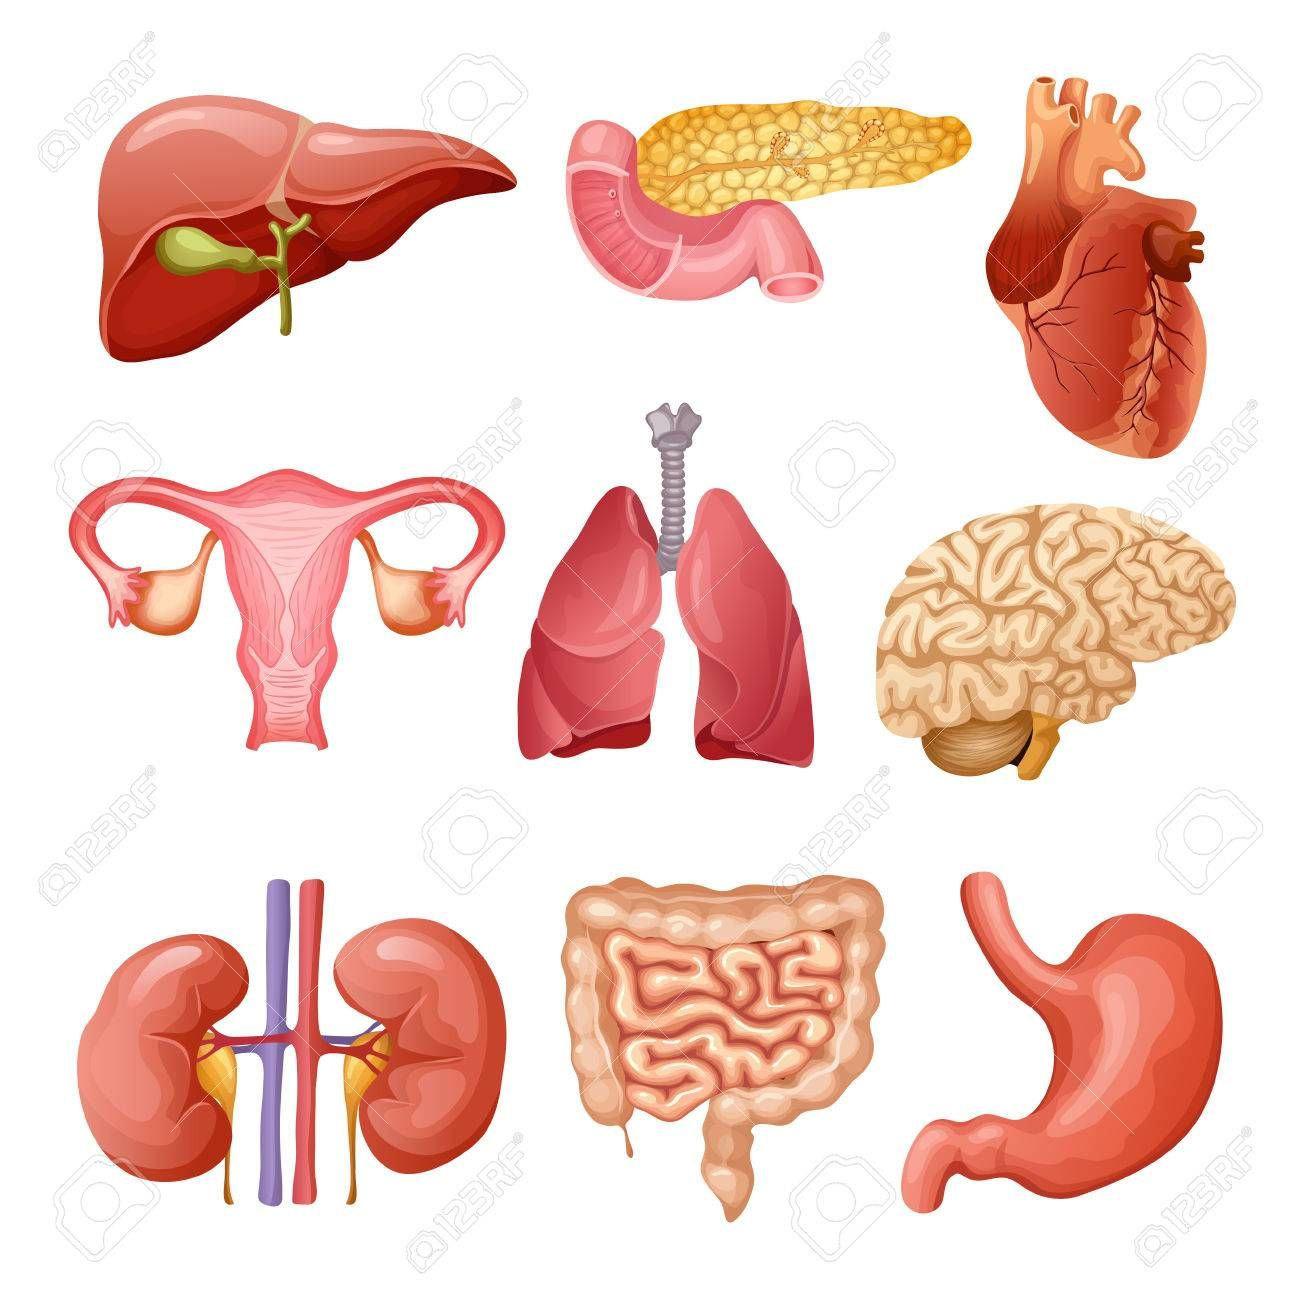 Cartoon Human Organs Set With Liver Pancreas Heart Female